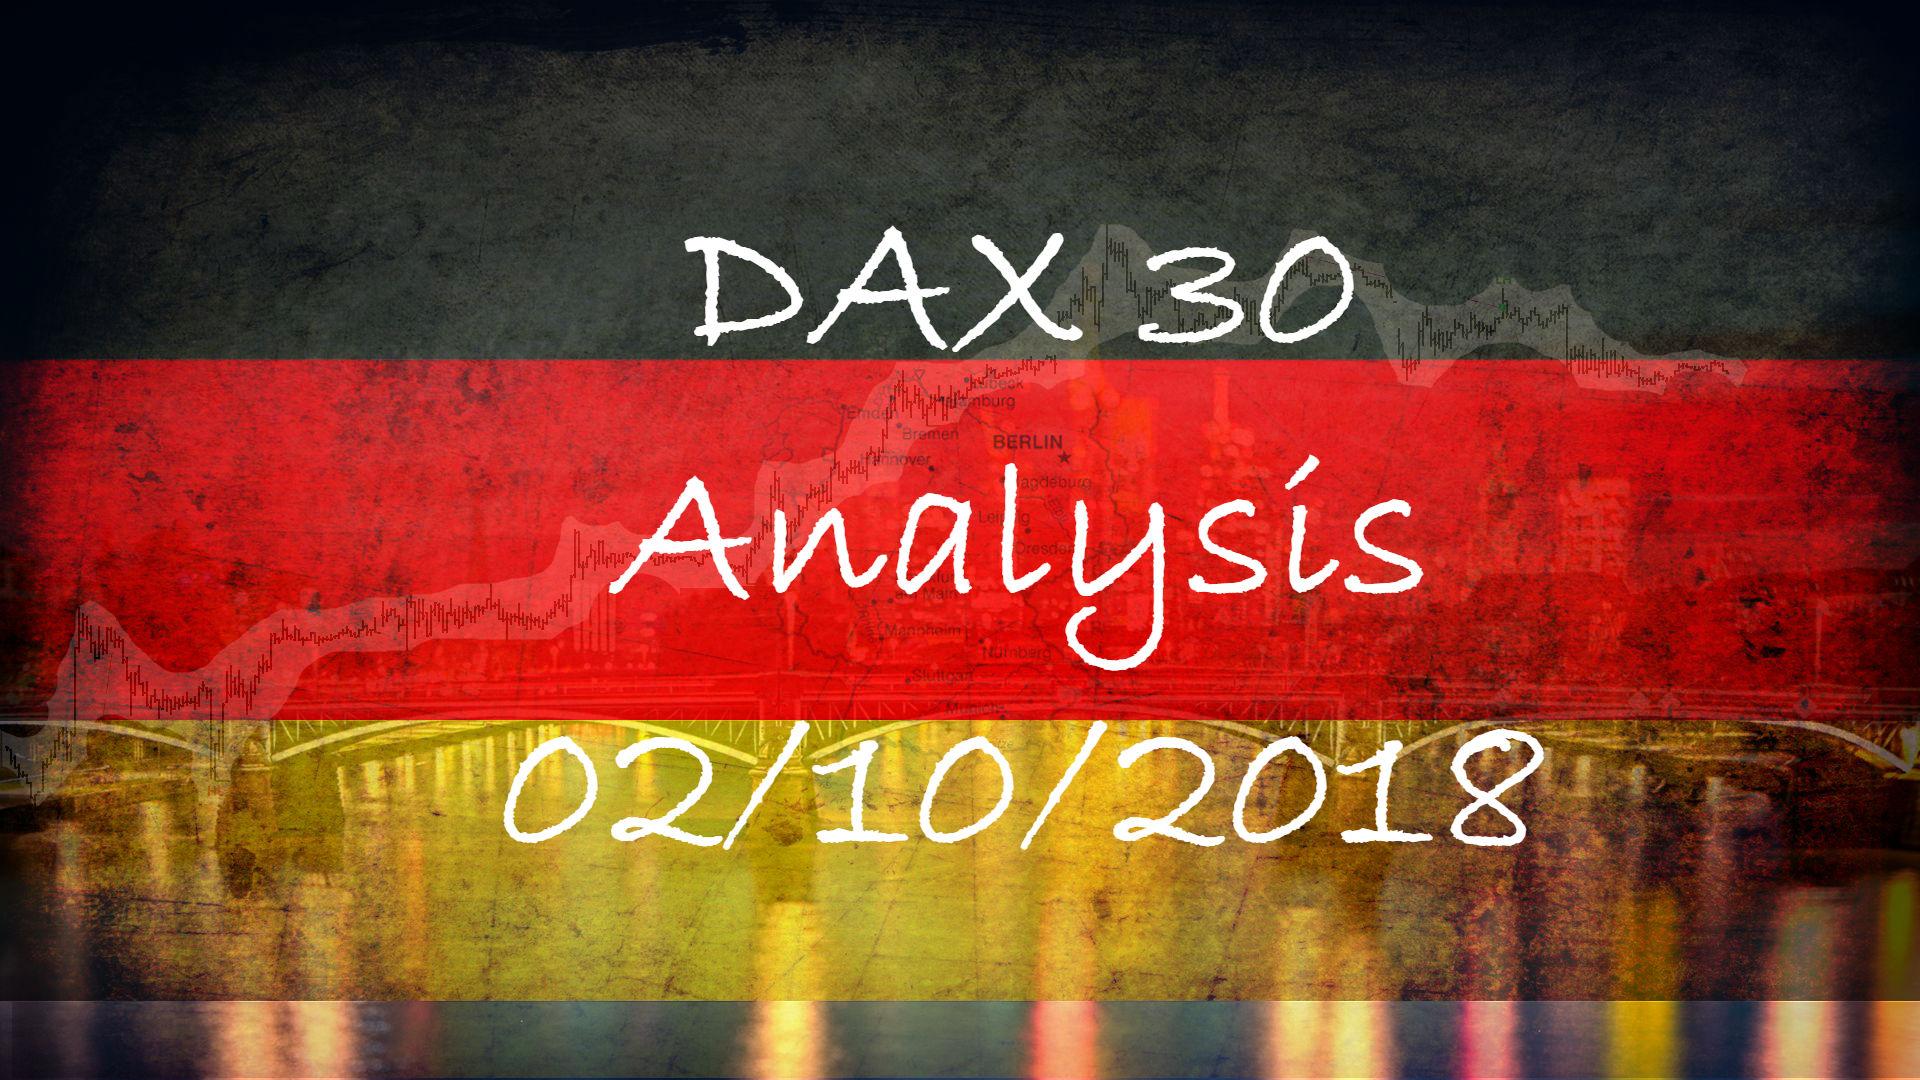 02-10-2018 Dax Technical Analysis